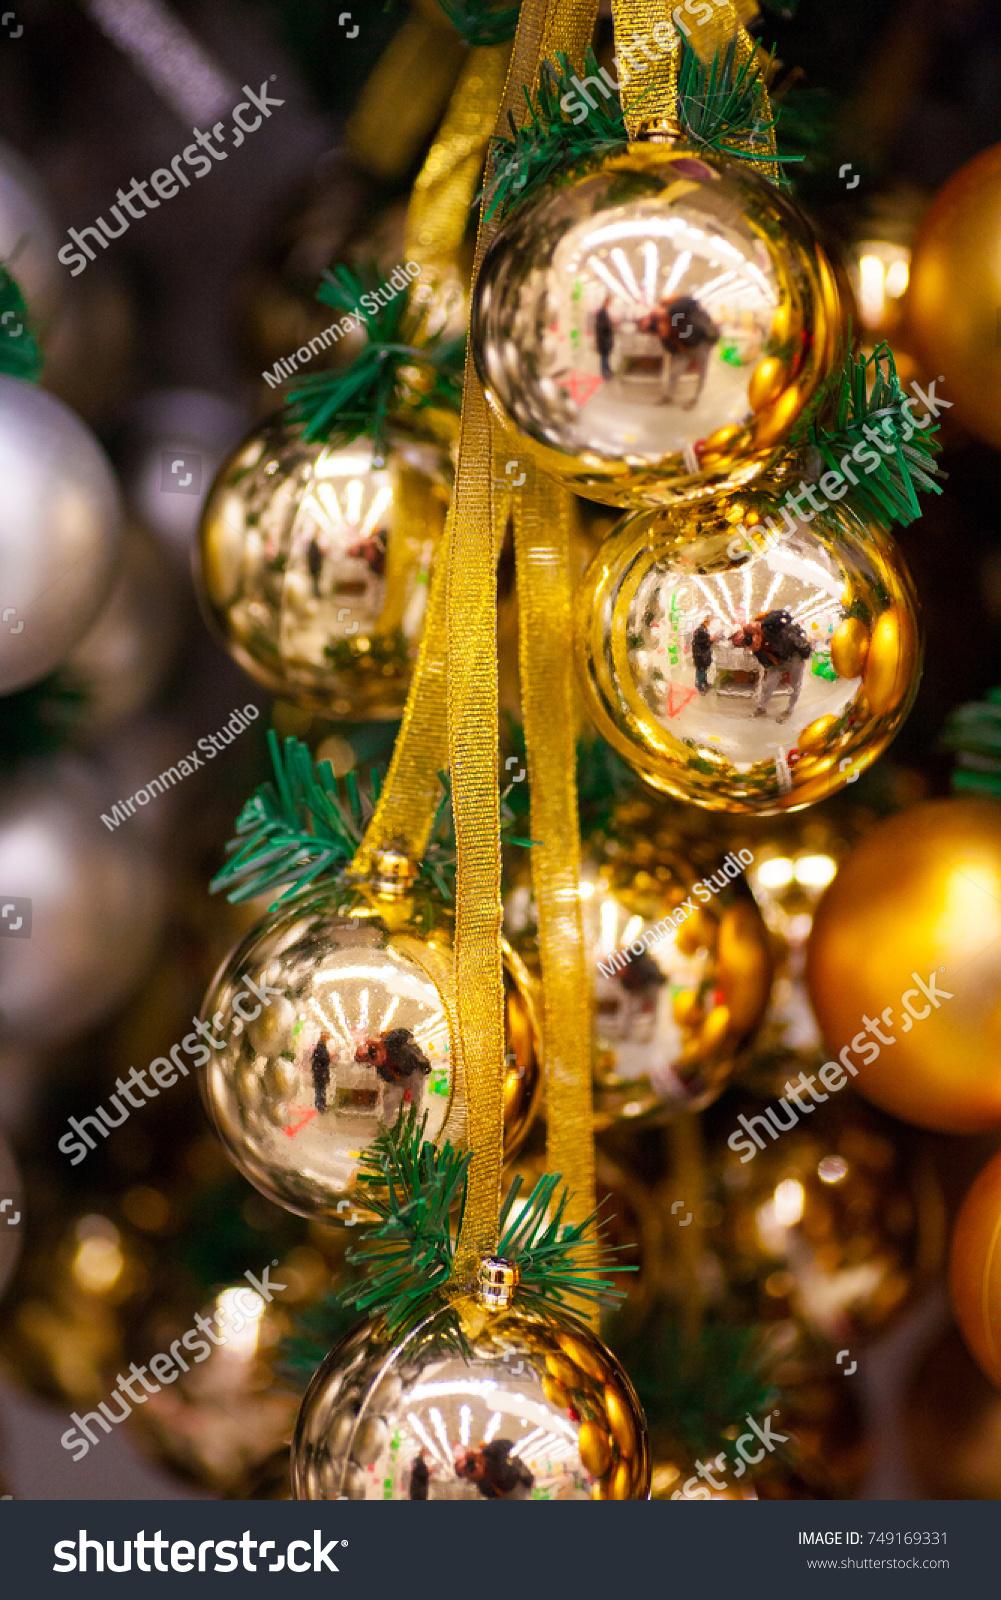 Multicolored Bright Shiny Christmas Decorations Ornaments Stock ...